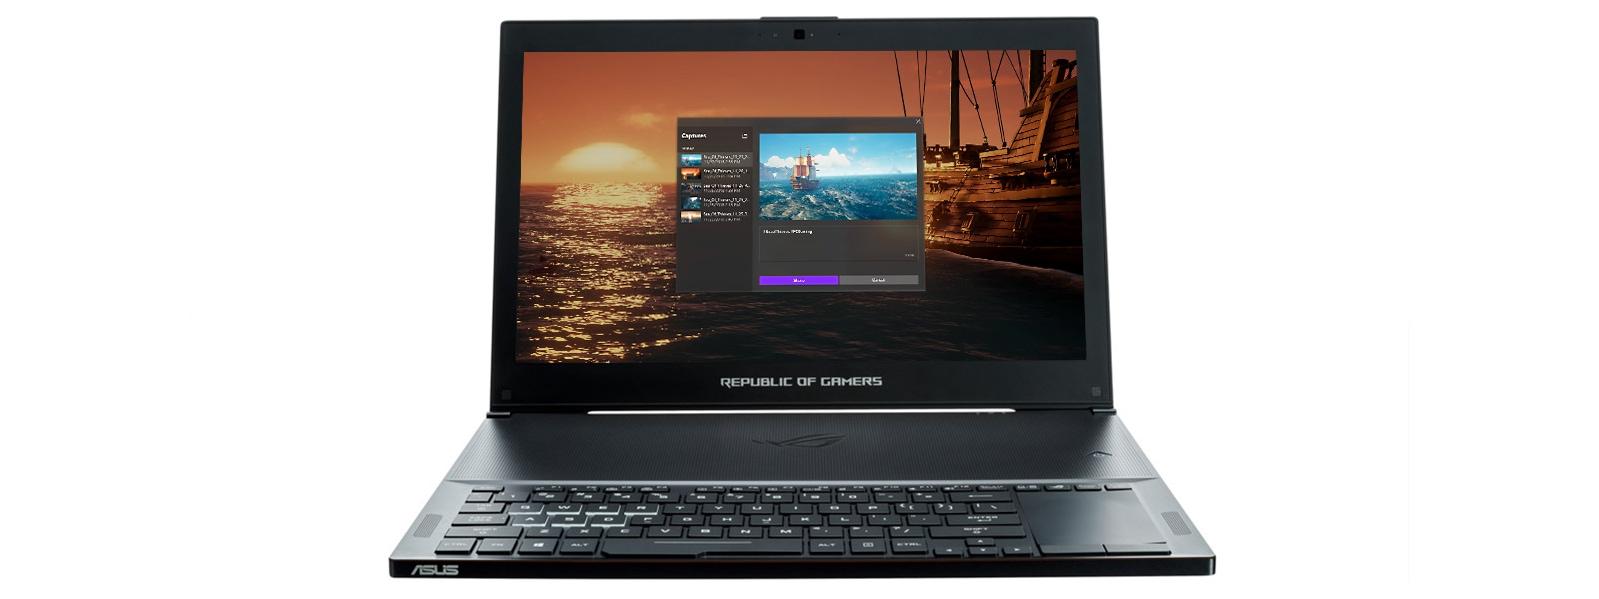 Windows 10 PC Gaming & Laptops | Microsoft